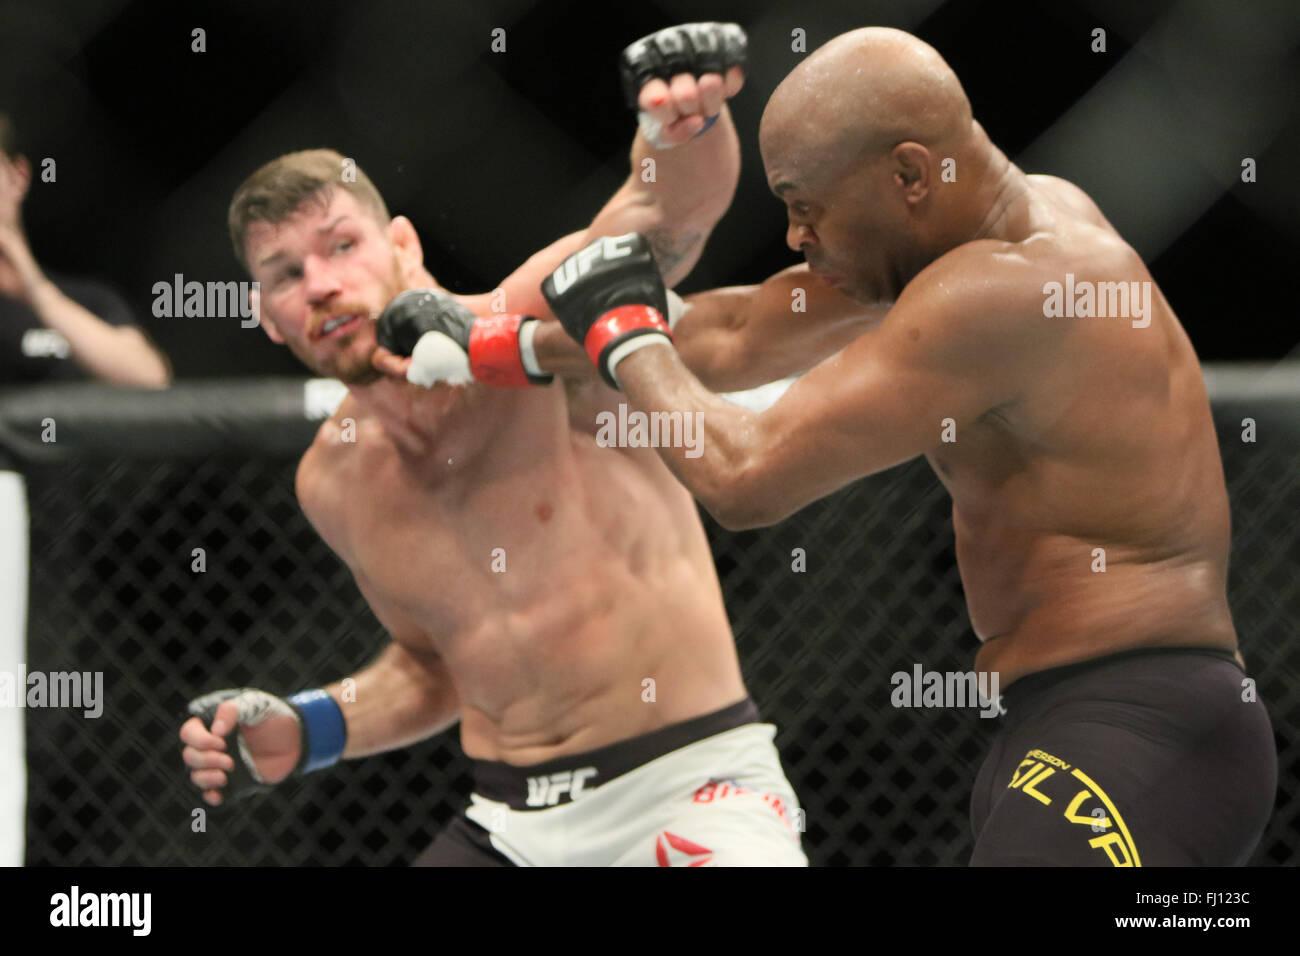 Londres, Royaume-Uni. Feb 27, 2016. L'UFC Fight Night Bisping vs Silva à l'O2, London Crédit: Dan Cooke/Alamy Live News Banque D'Images